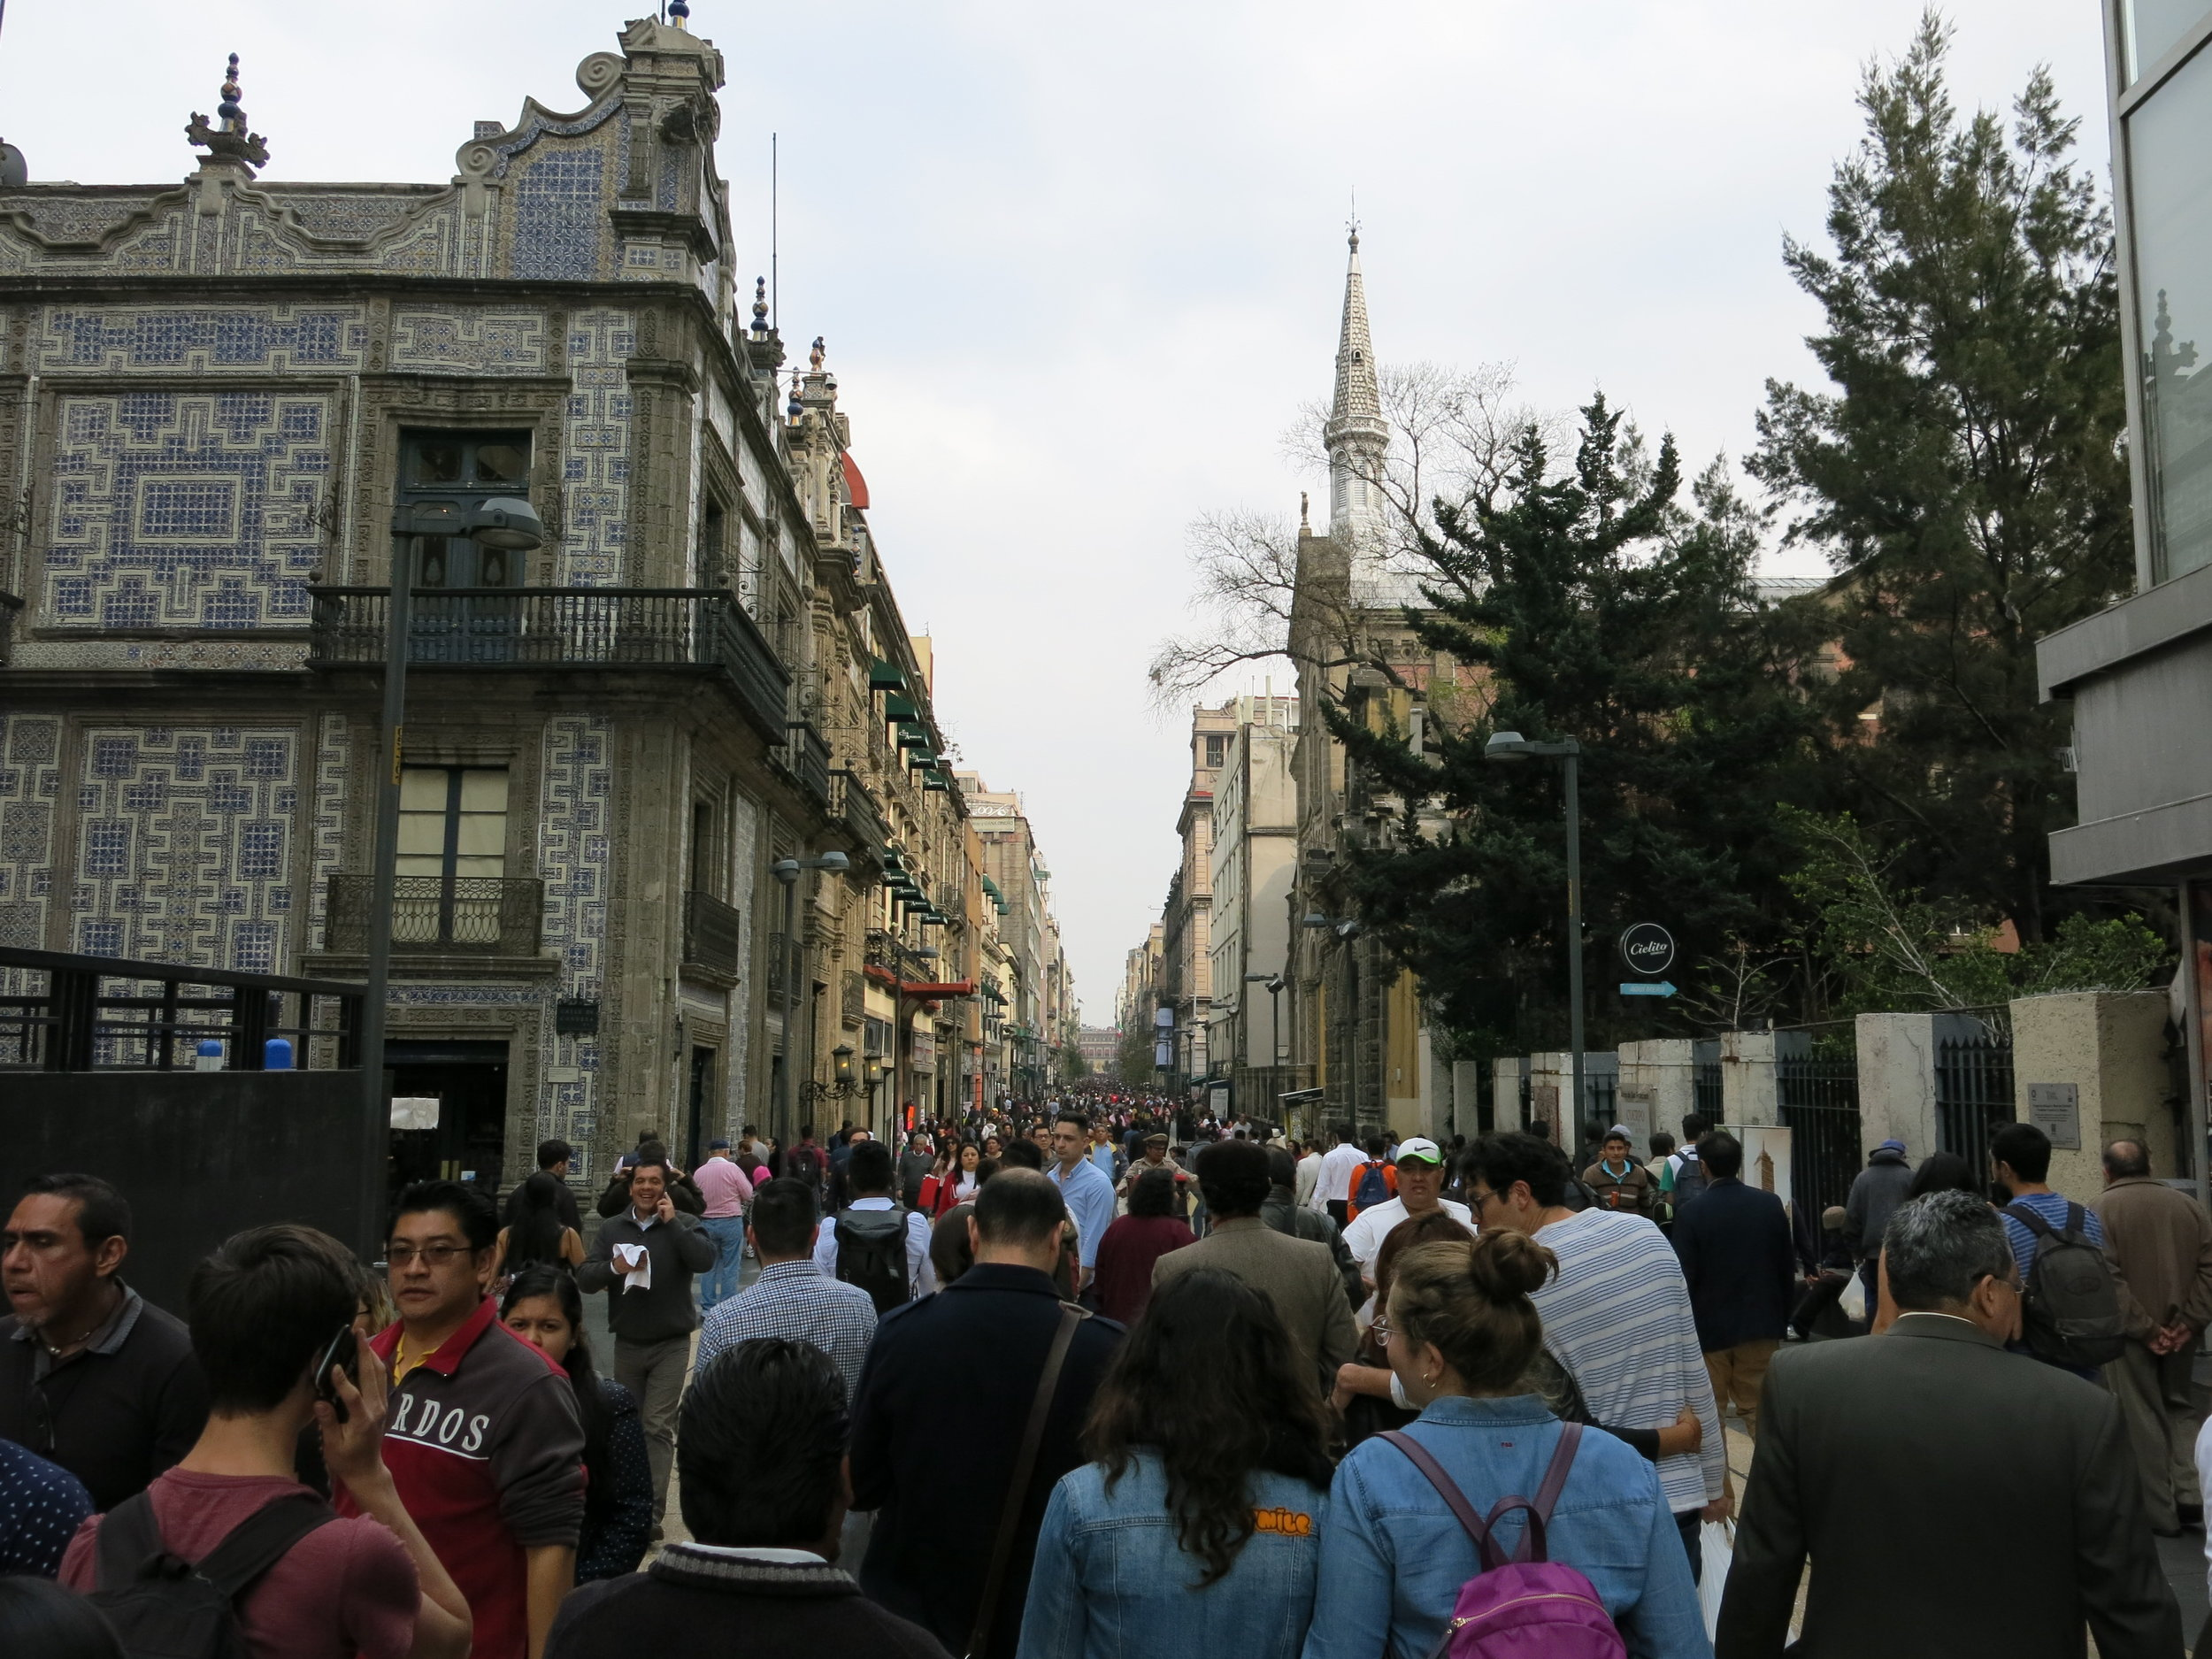 Centro Historico Neighborhood in Mexico City